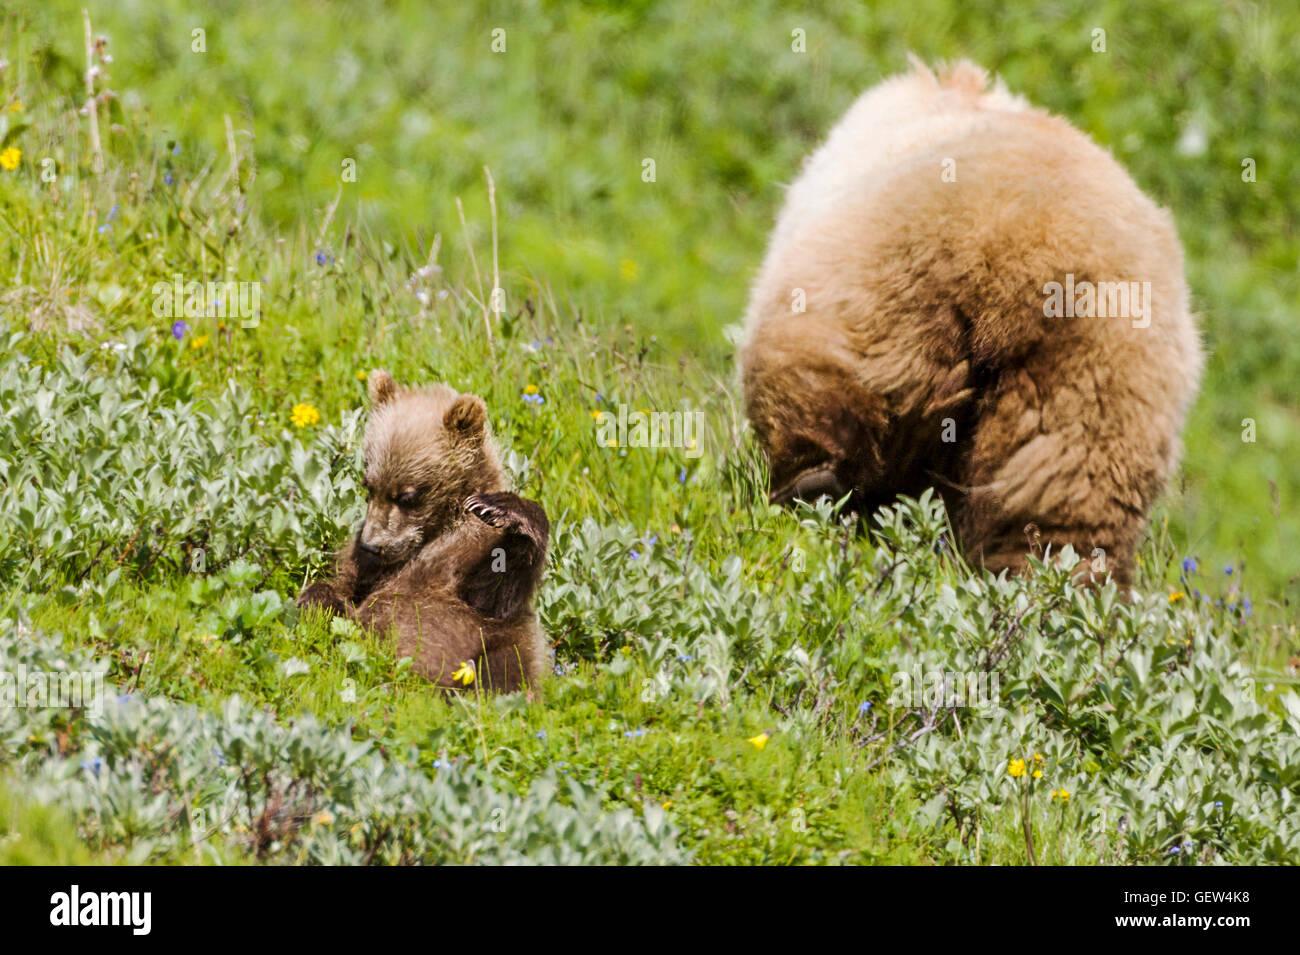 Sow (hembra) oso grizzly (Ursus arctos horribilis) con el Cubs, proximidad a la autopista, pase el Parque Nacional Denali, Alaska, EE.UU. Foto de stock